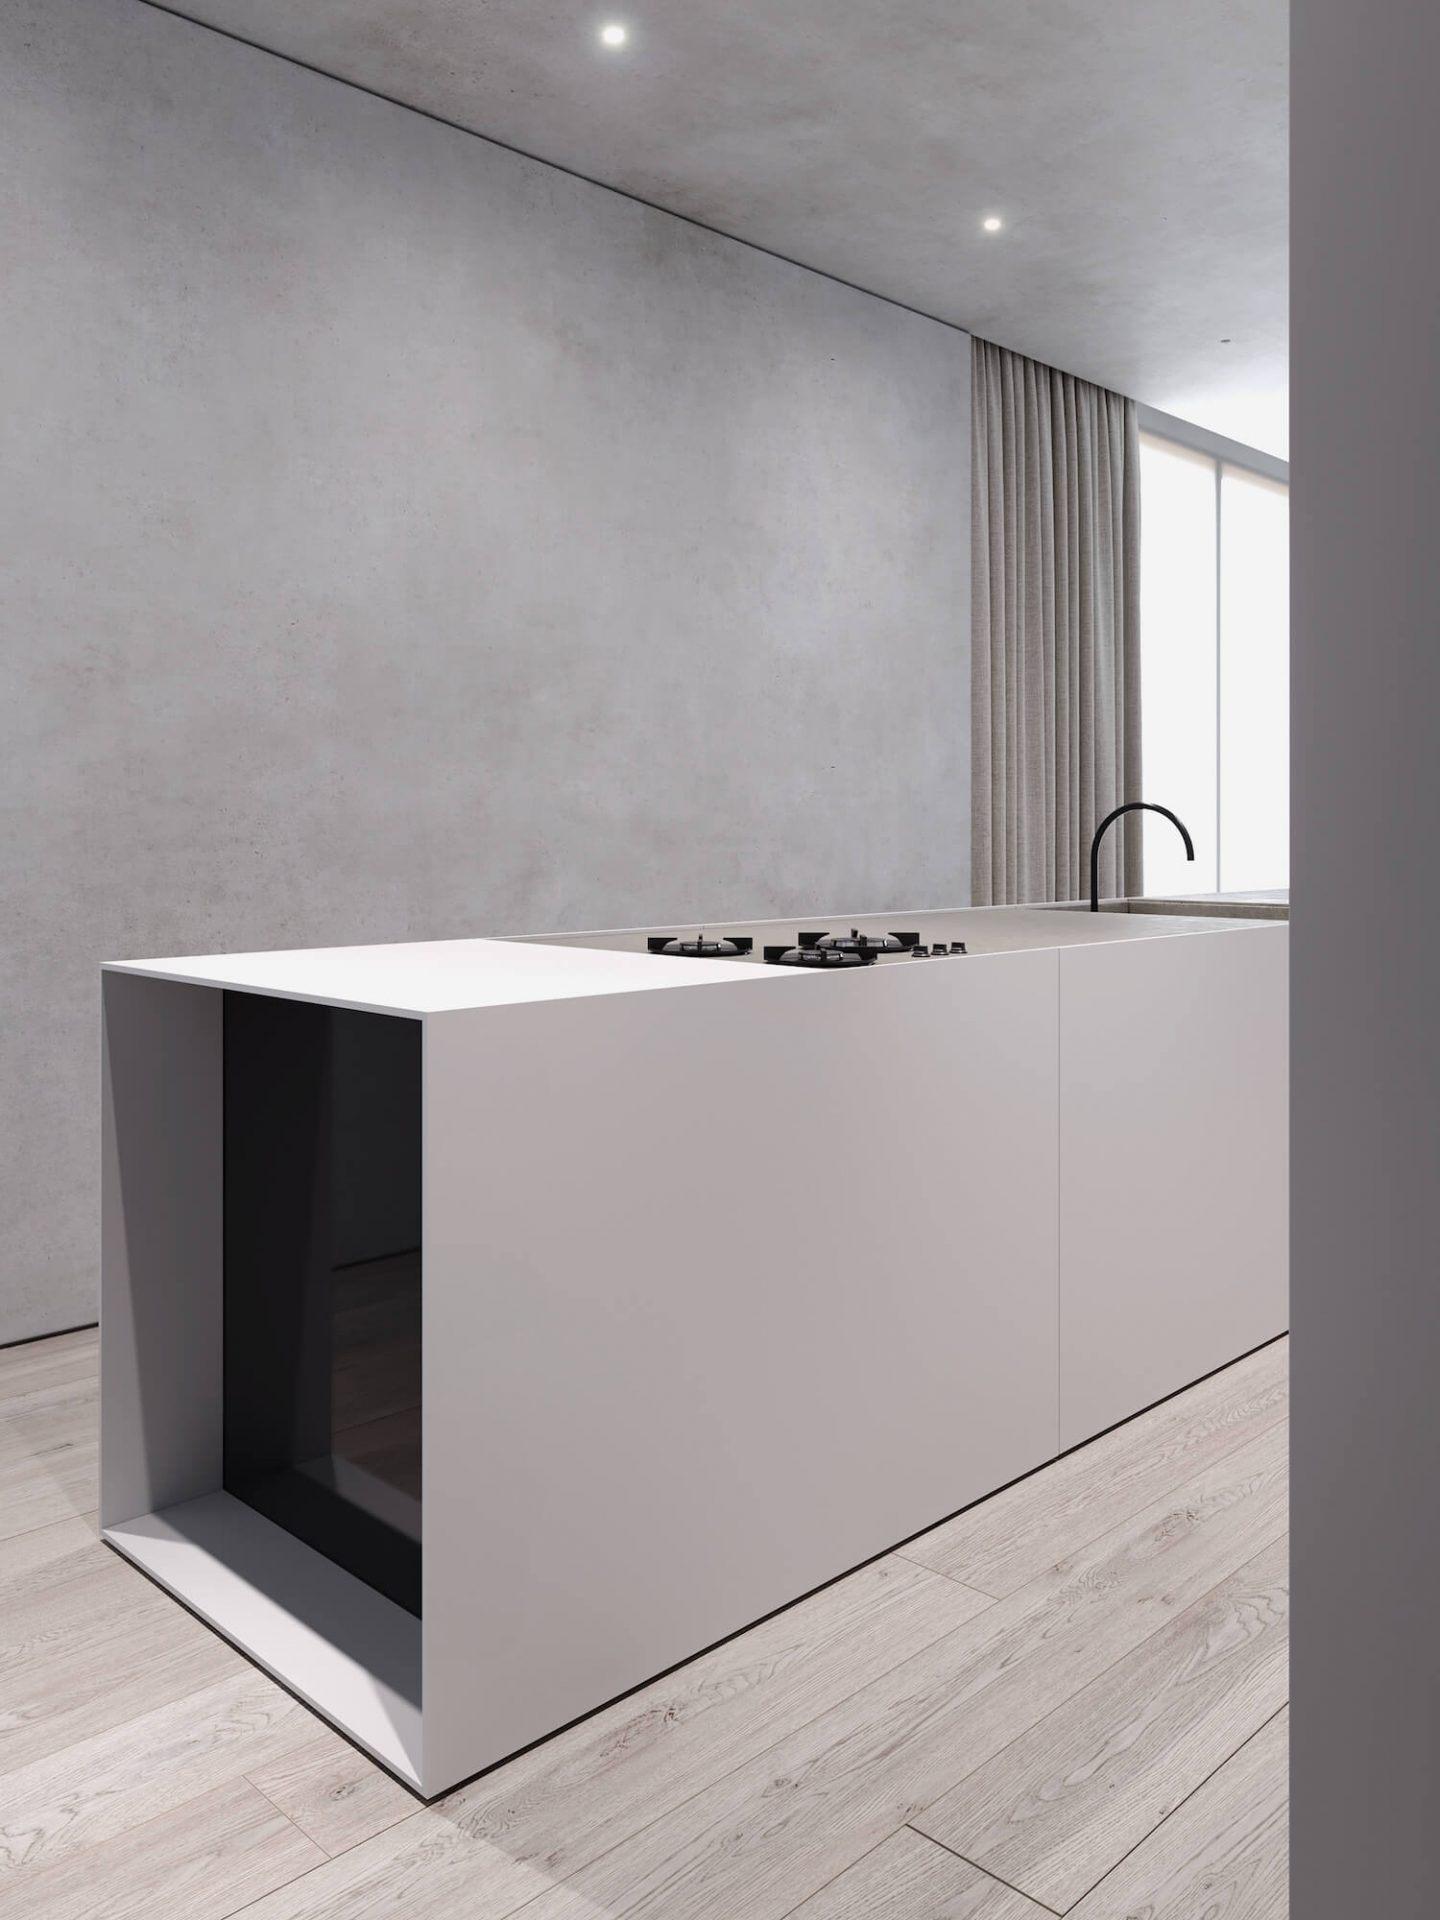 IGNANT-Architecture-Tamizo-Warsaw-House-3